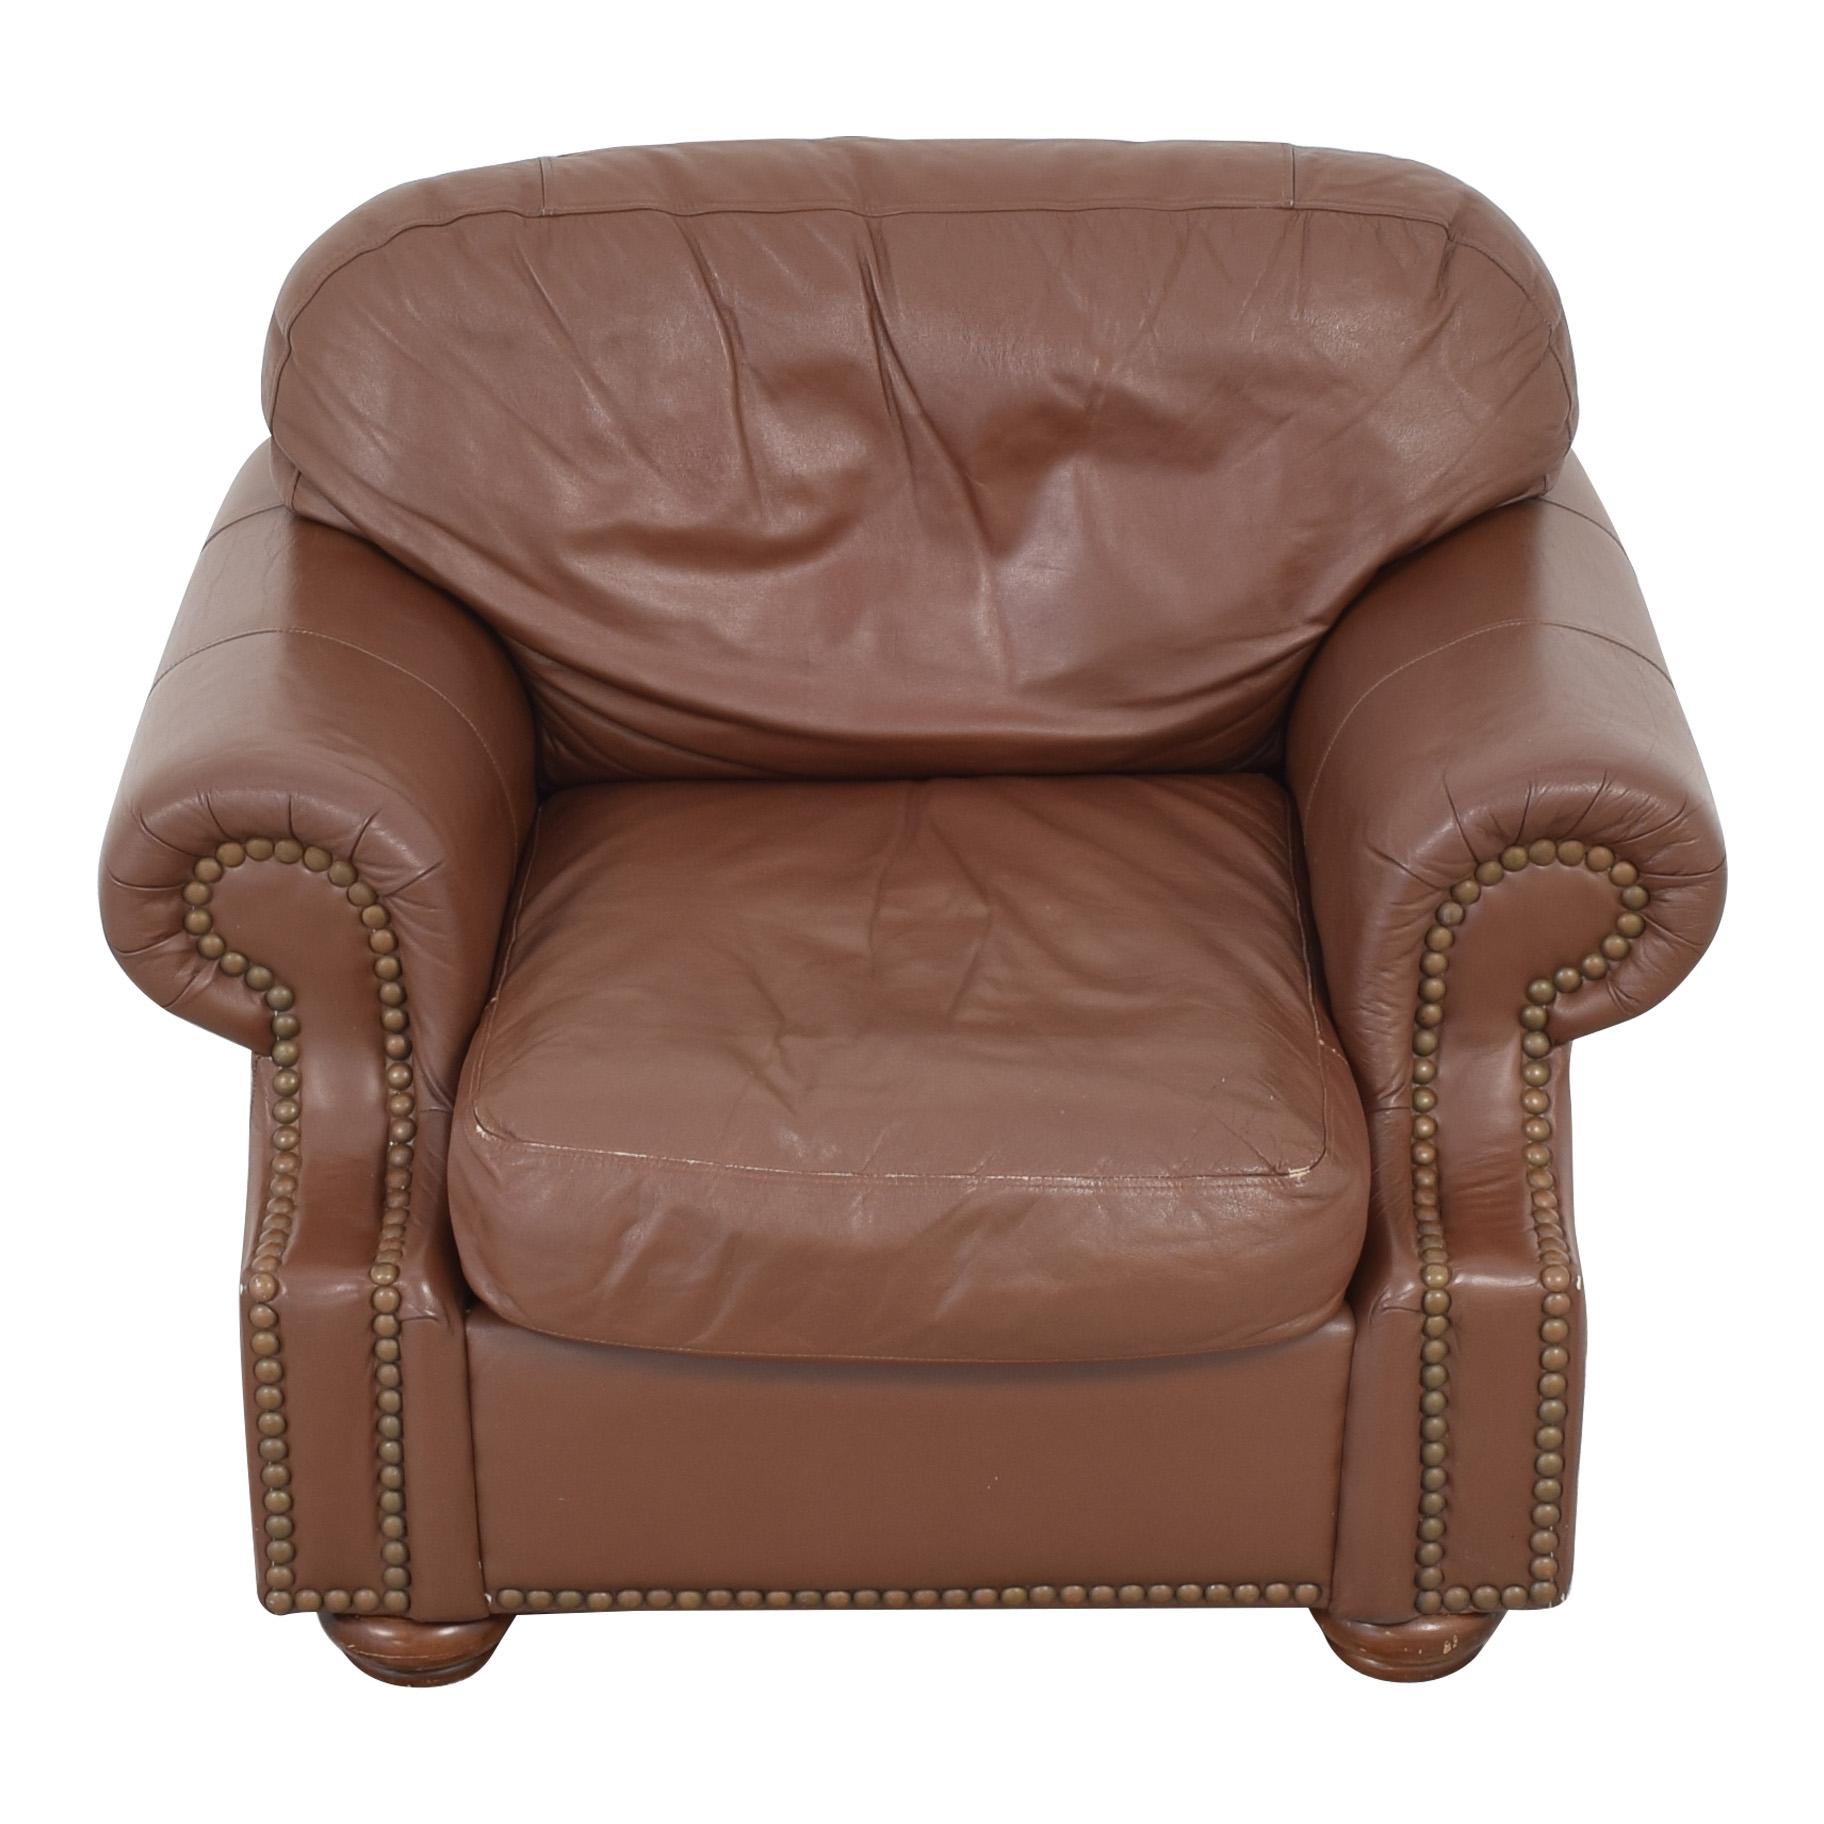 Arhaus Arhaus Nailhead Trim Club Chair nyc